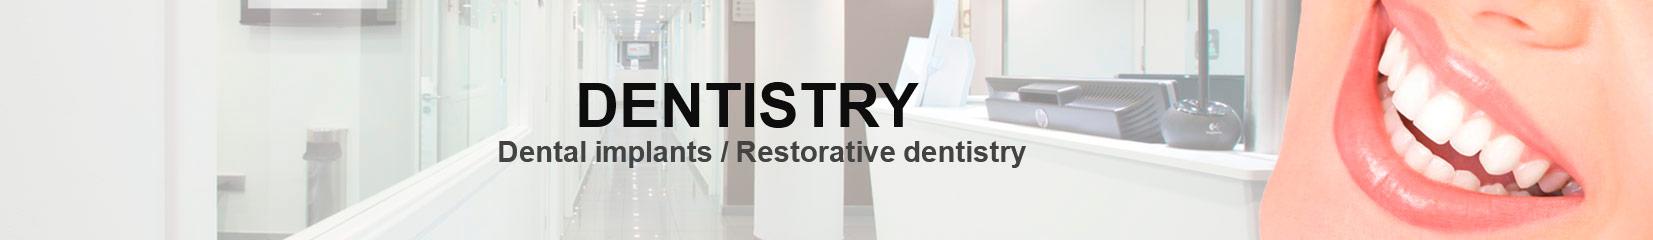 dentistry-banner2